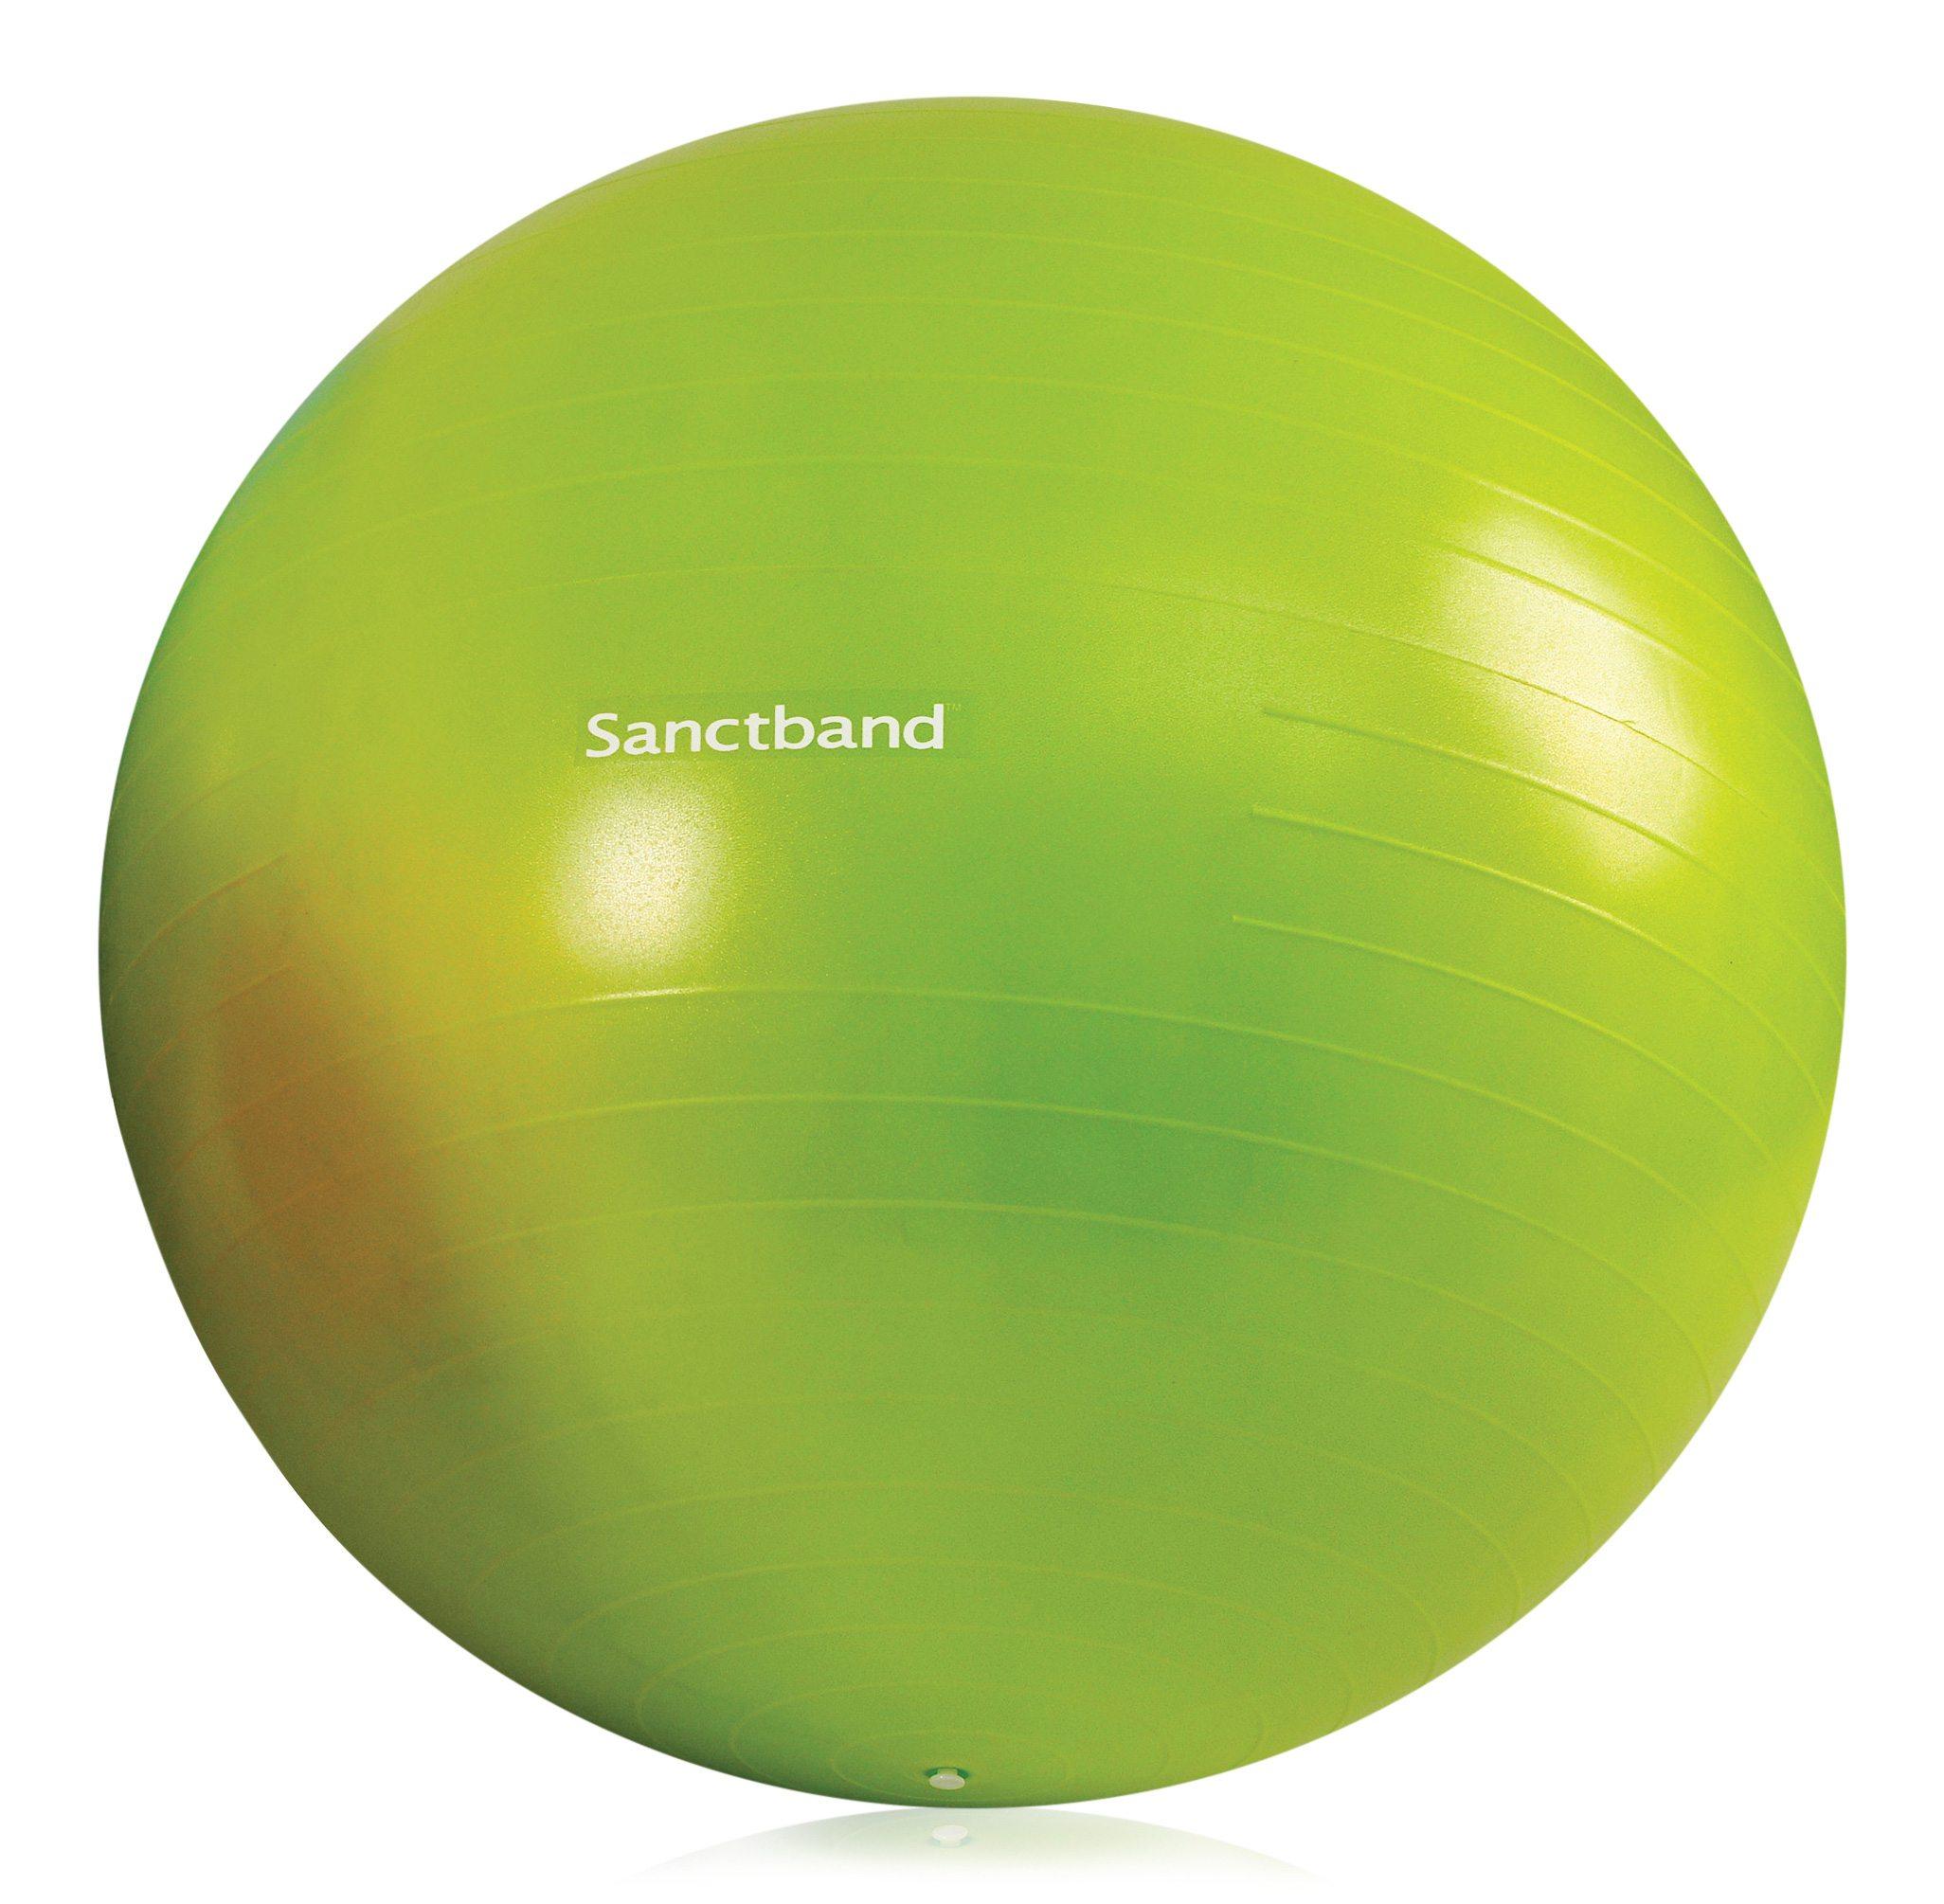 Sanctband Anti Burst Gymnastikball Grün 65cm Durchmesser